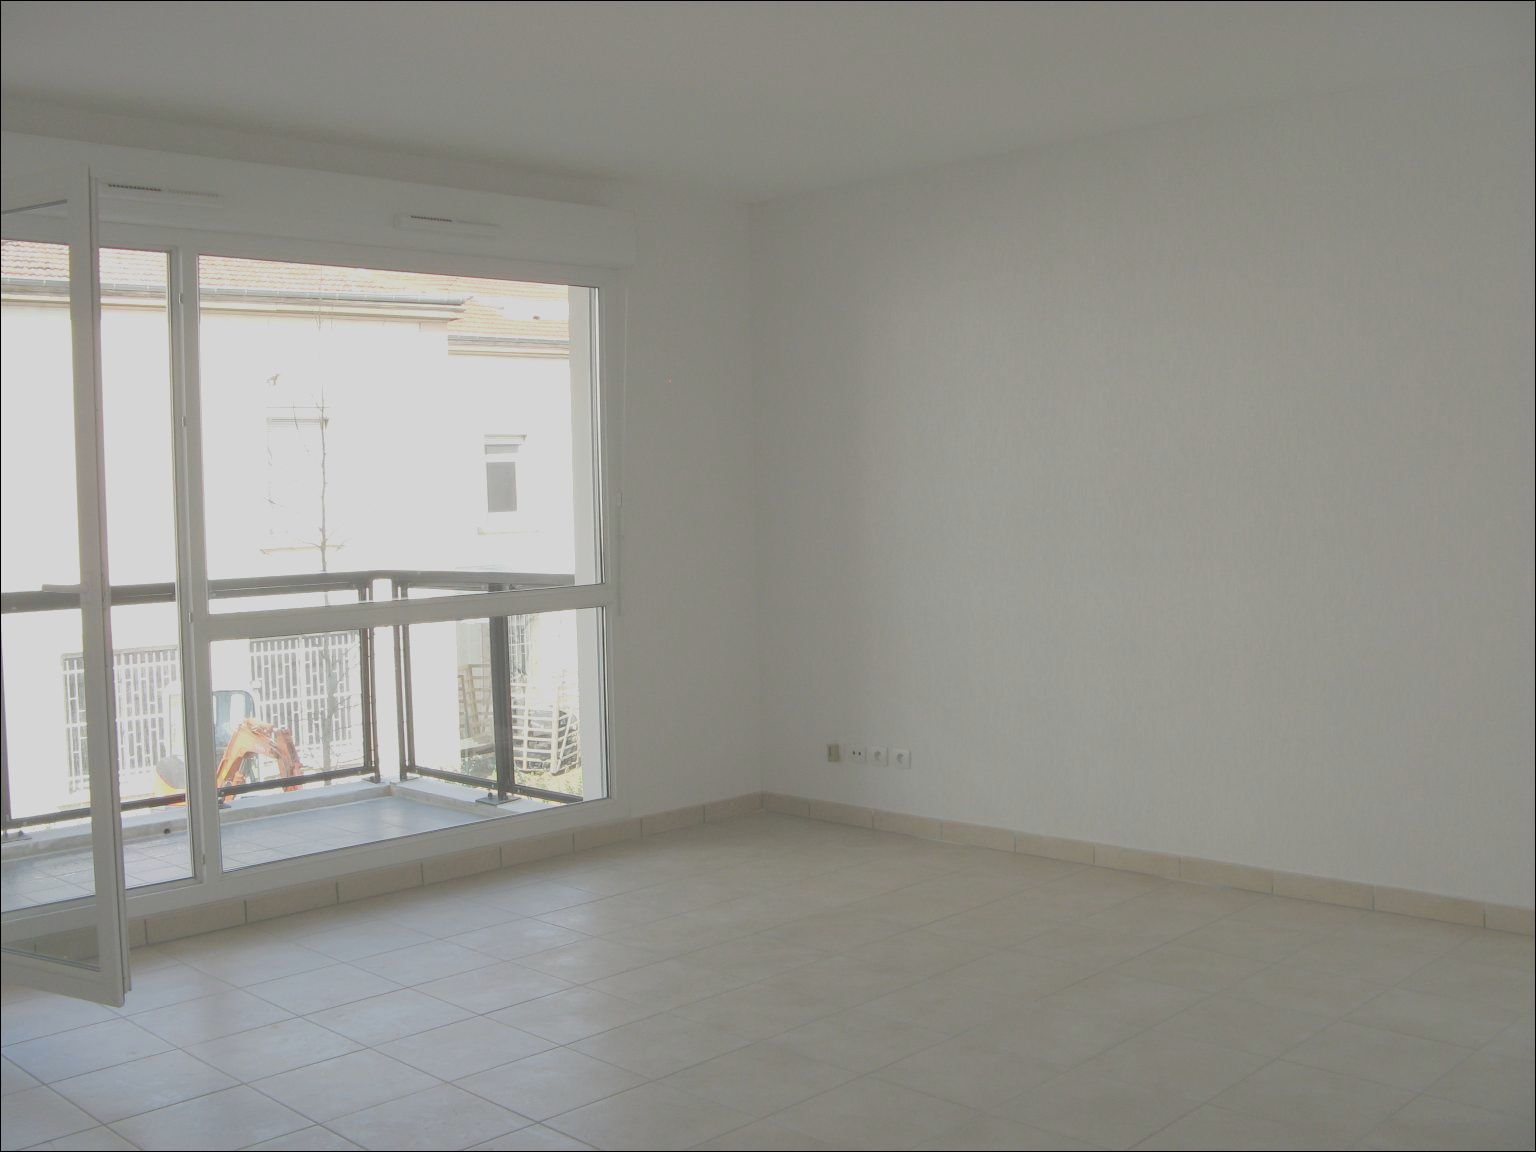 small empty room empty bedroom